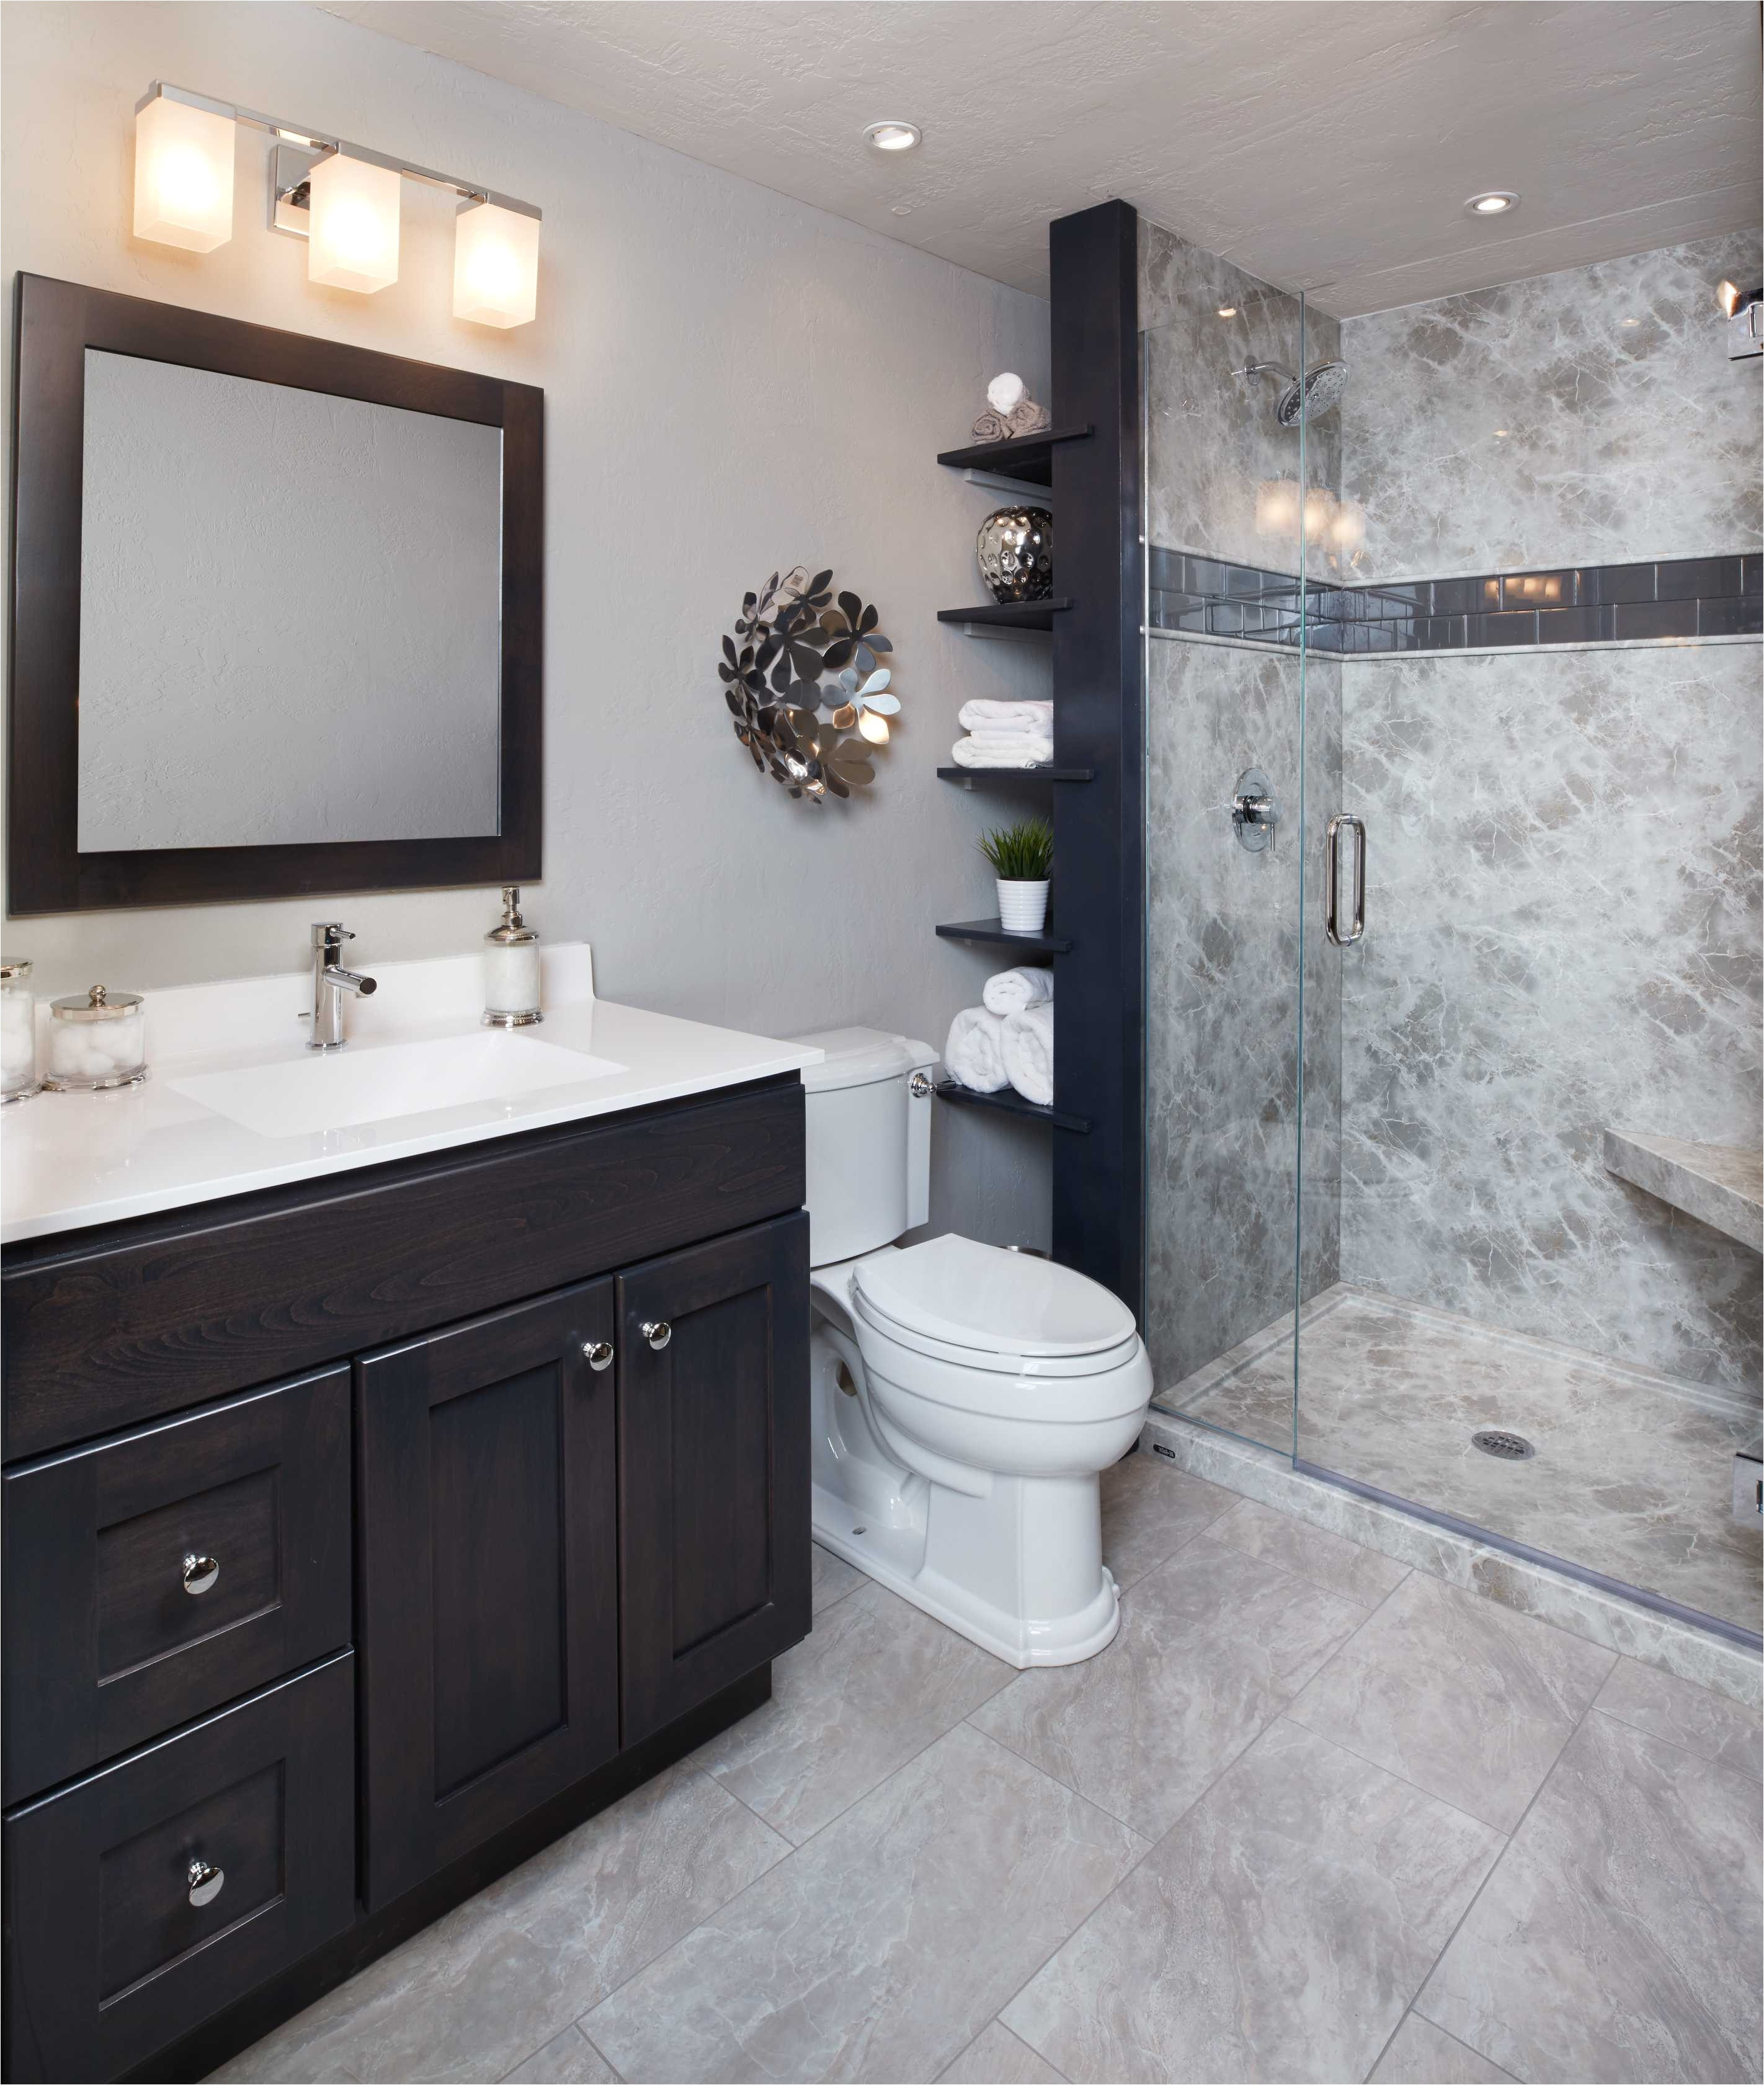 Bathtub Liner Lowes Best Bathtub Installation Lowes Bathtubs Information